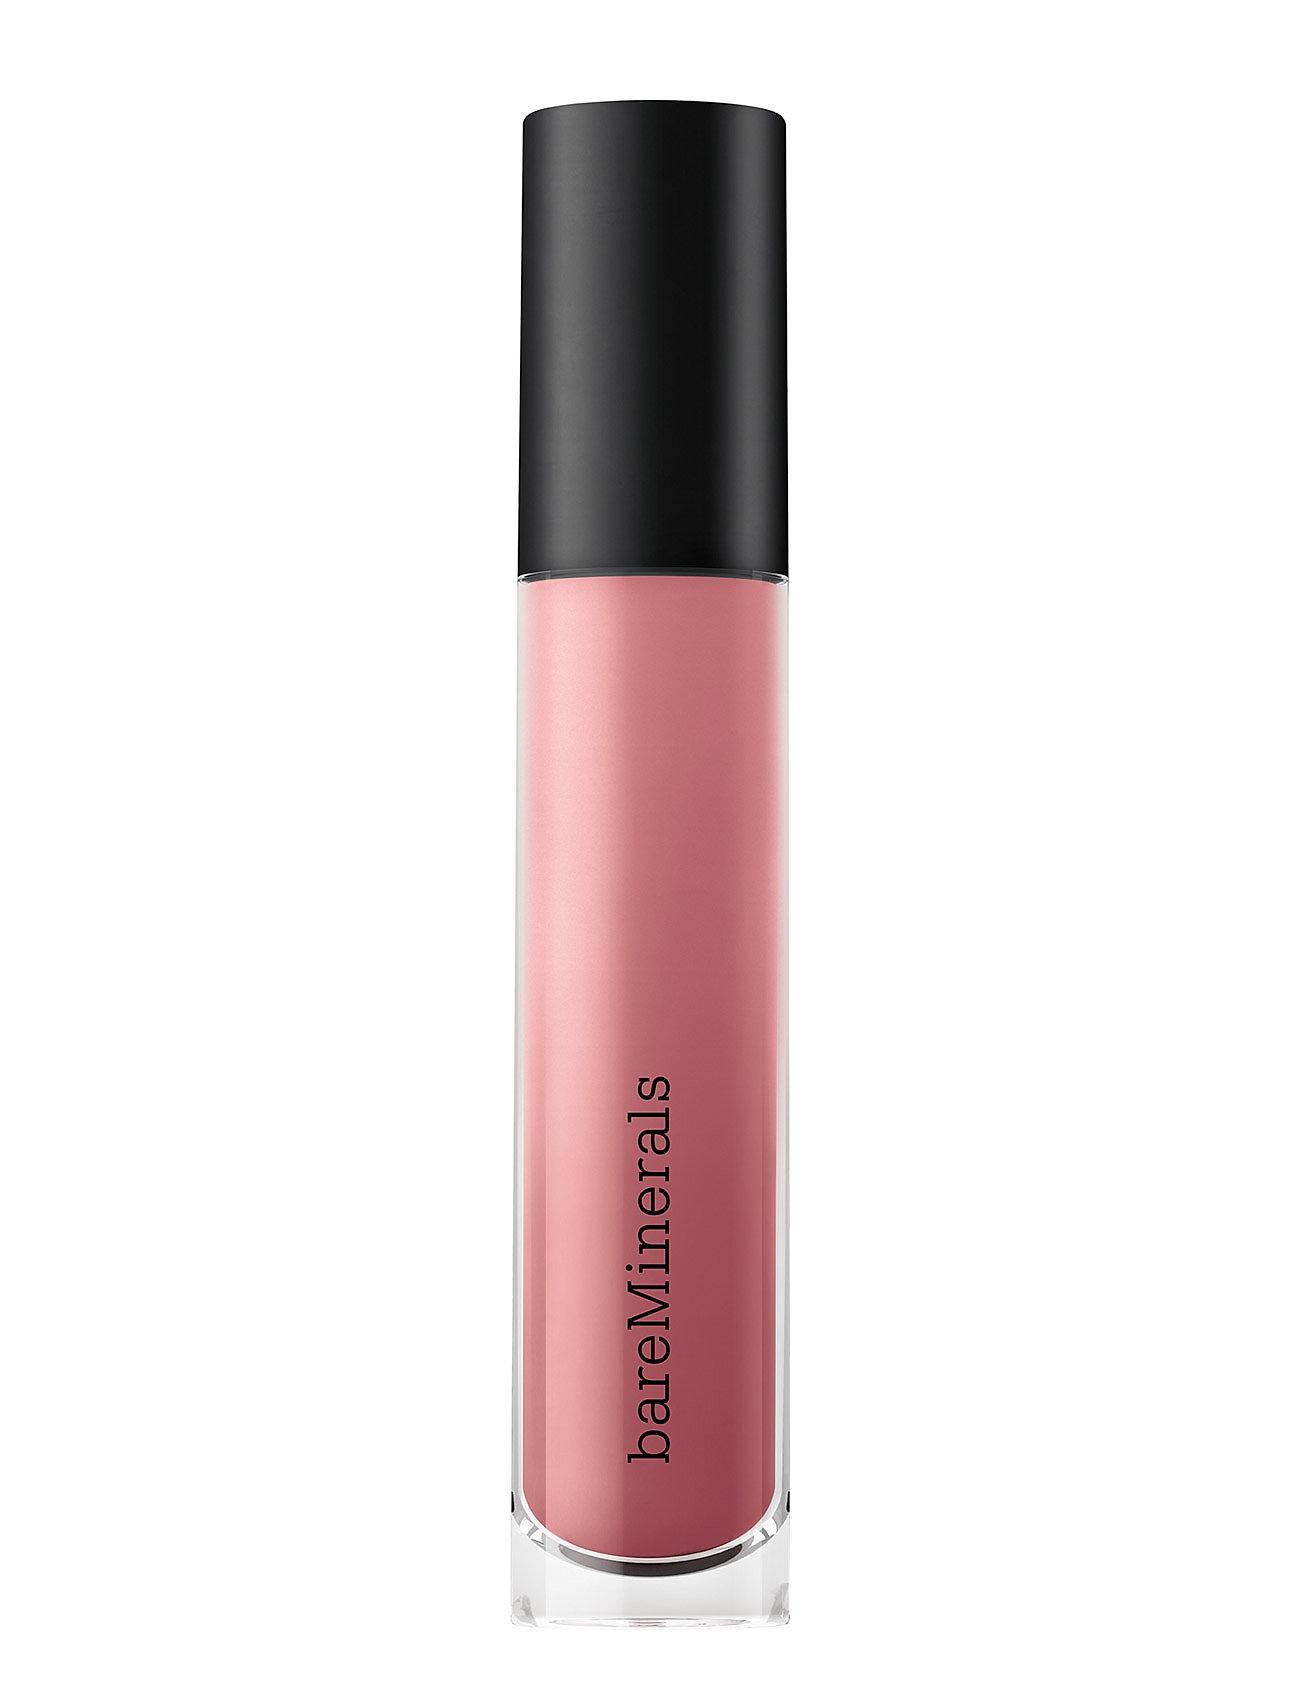 Image of Gen Nude Matte Liquid Lipcolor Læbestift Makeup Lyserød BareMinerals (3067521893)